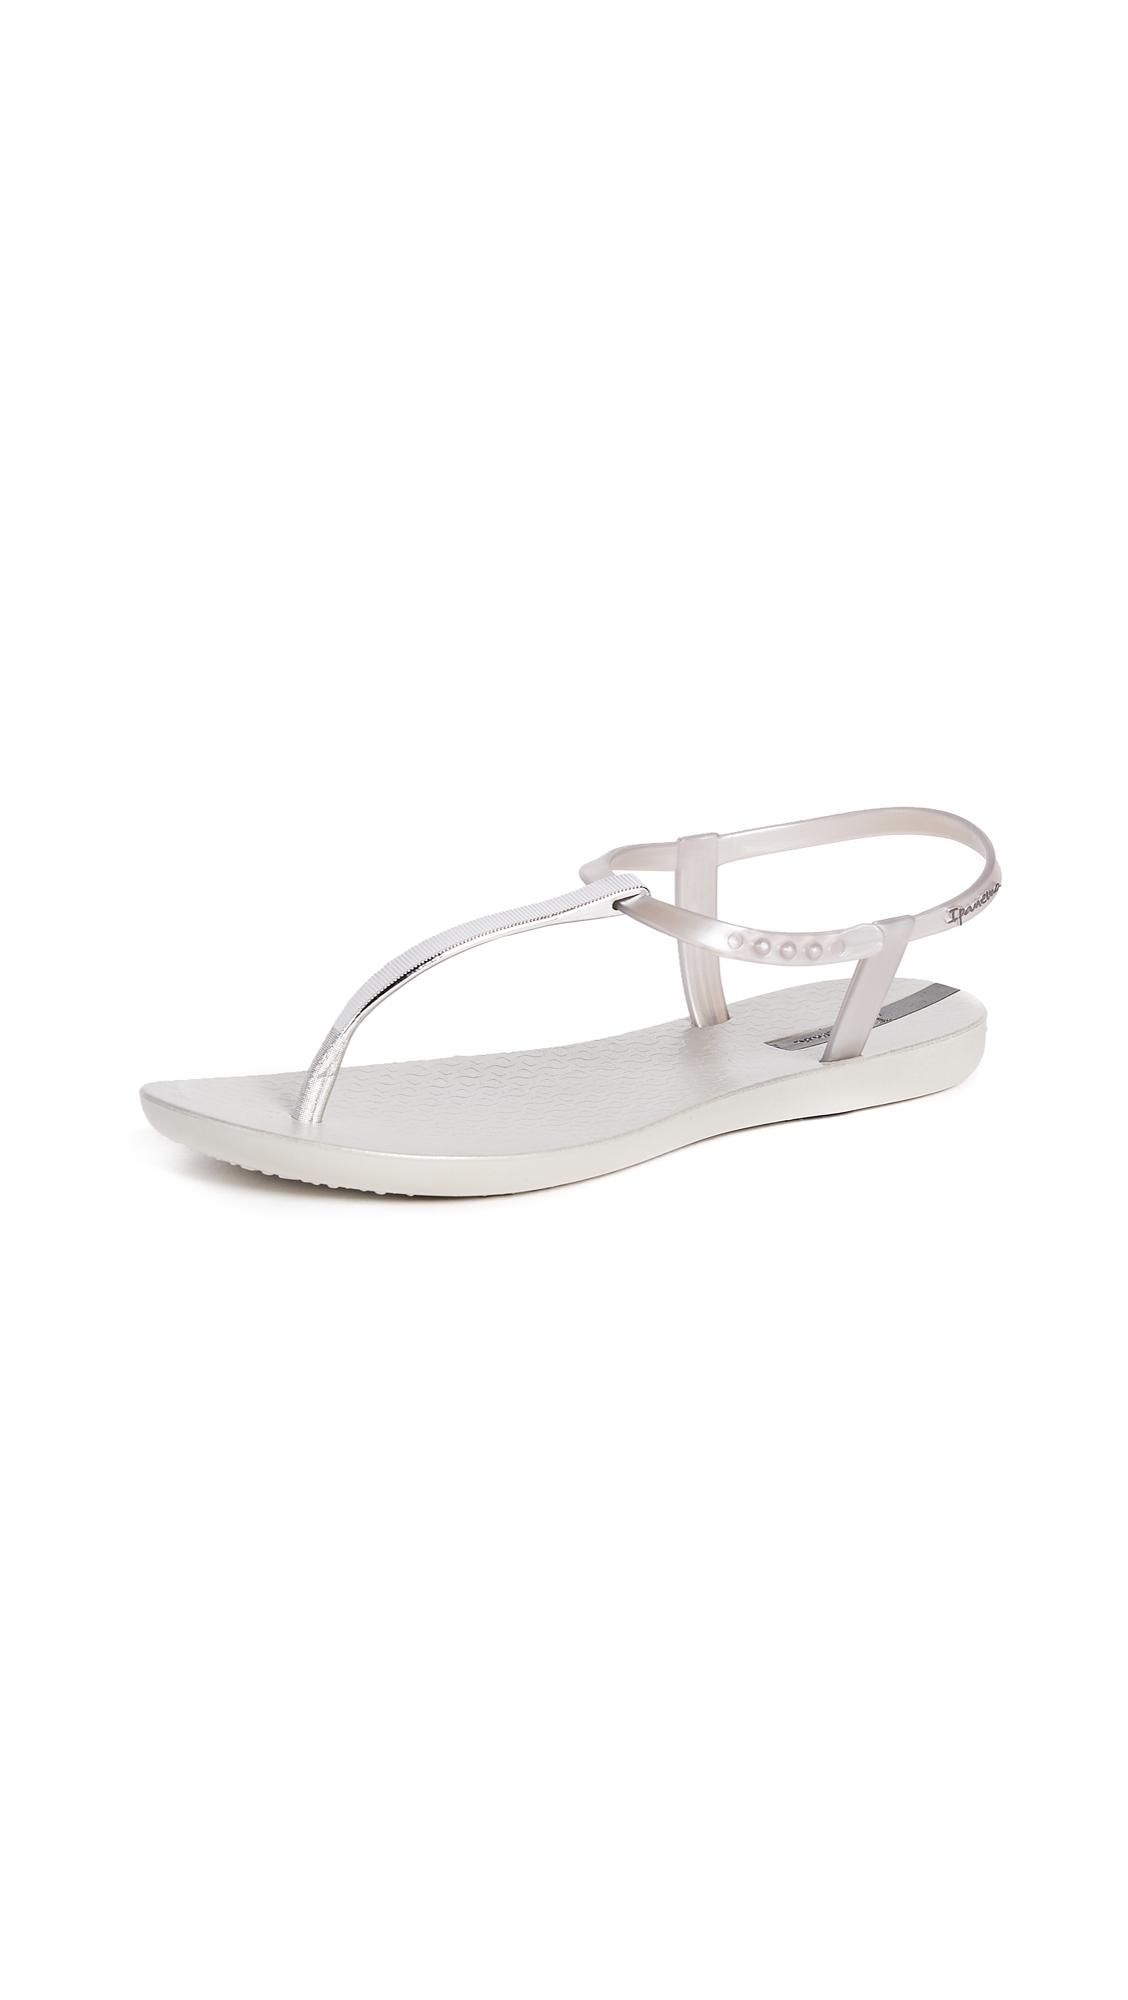 Ipanema Bandeau T-Strap Sandals - Silver/Silver